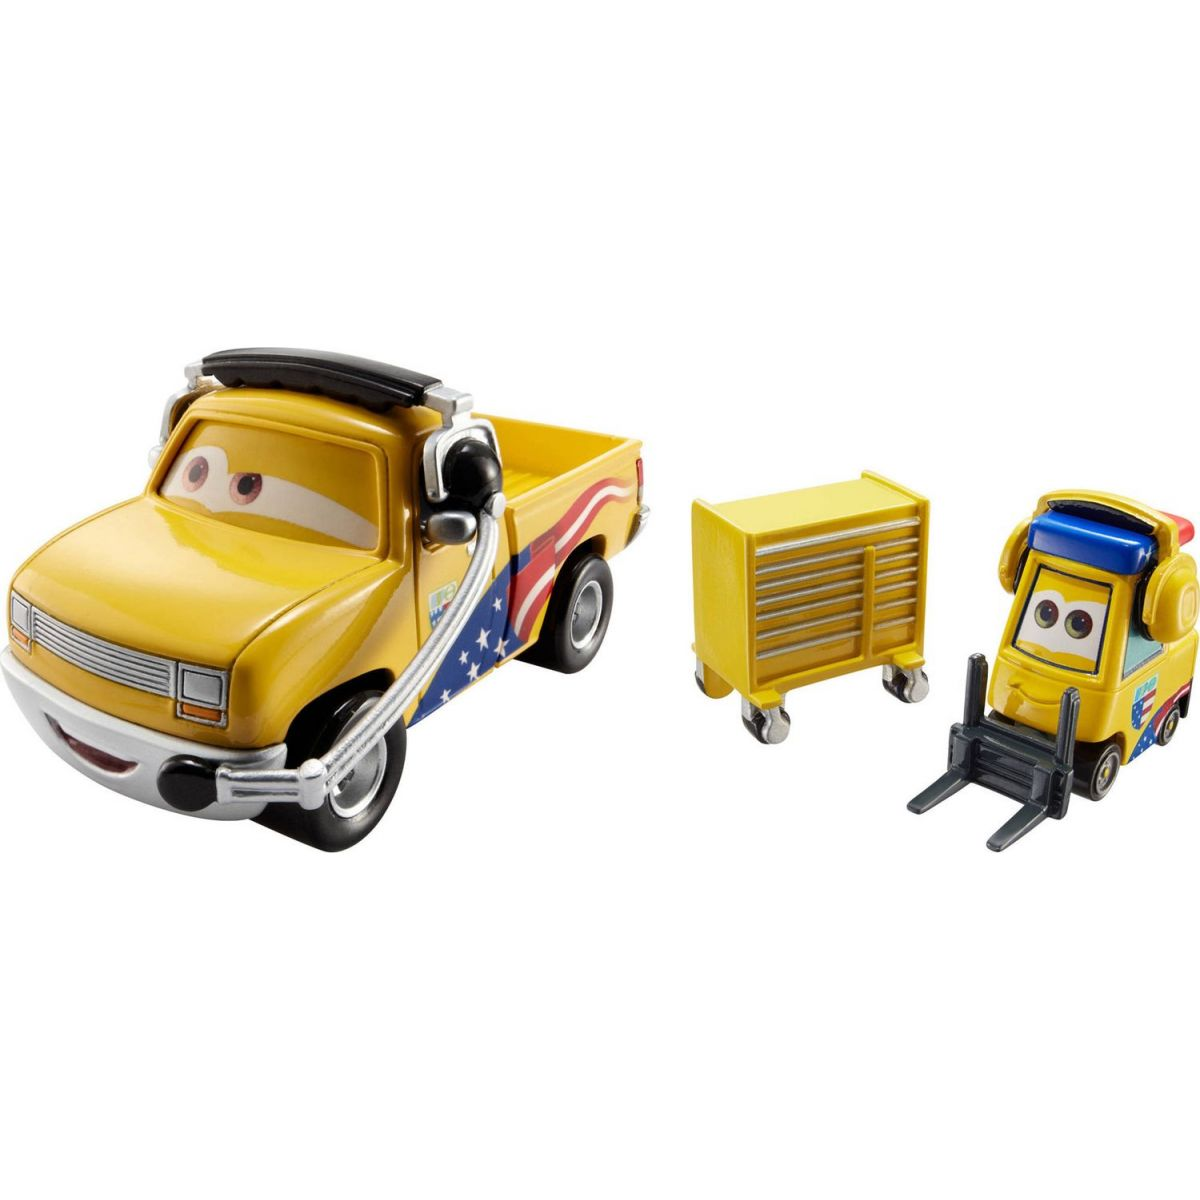 Mattel Cars 2 Autíčka 2ks - Jeff Gorvette Pitty a John Lassetire